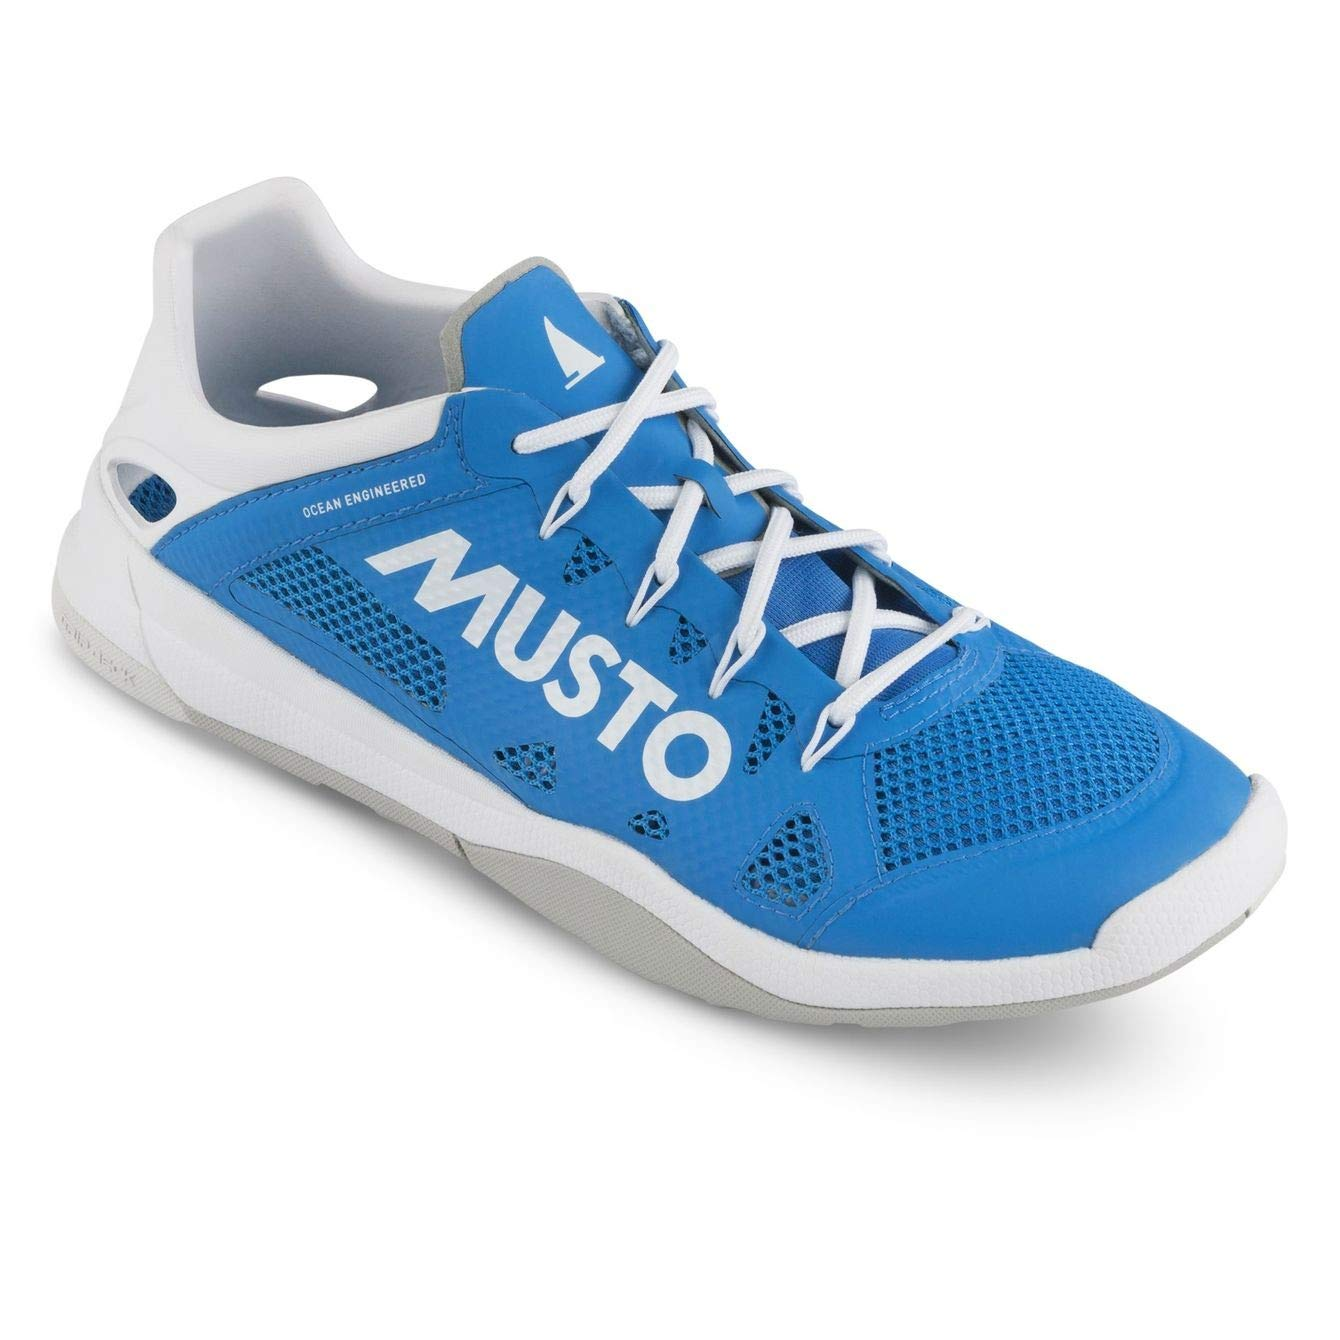 Musto Size Dynamic Pro II Uk Sailing Shoes – Brilliant B07B8PJTJP Blue B07B8PJTJP Uk Size 10, トナー職人:305dbff2 --- sharoshka.org